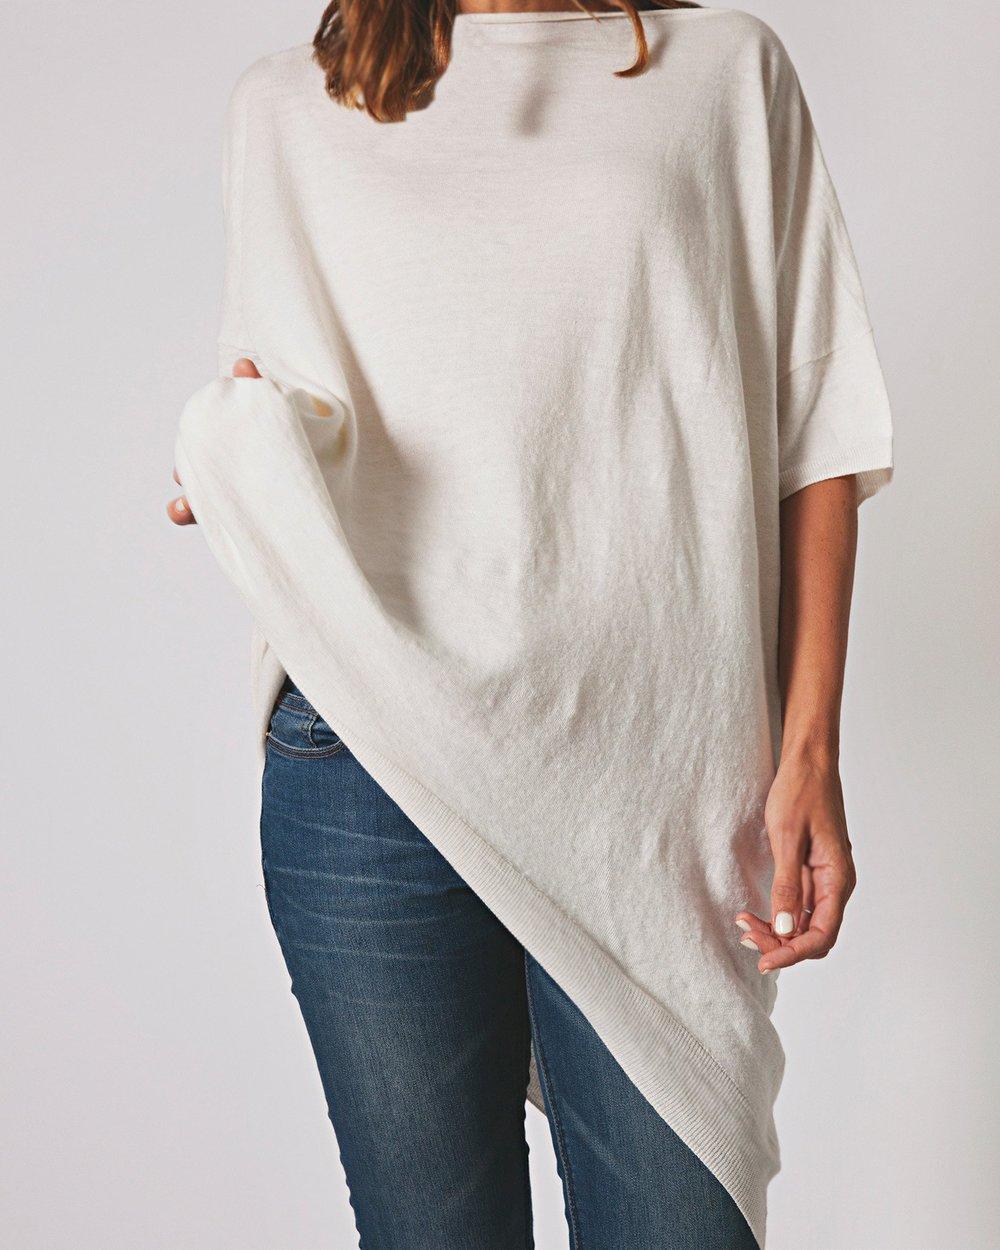 French Linen Oversized Tee   {$160}